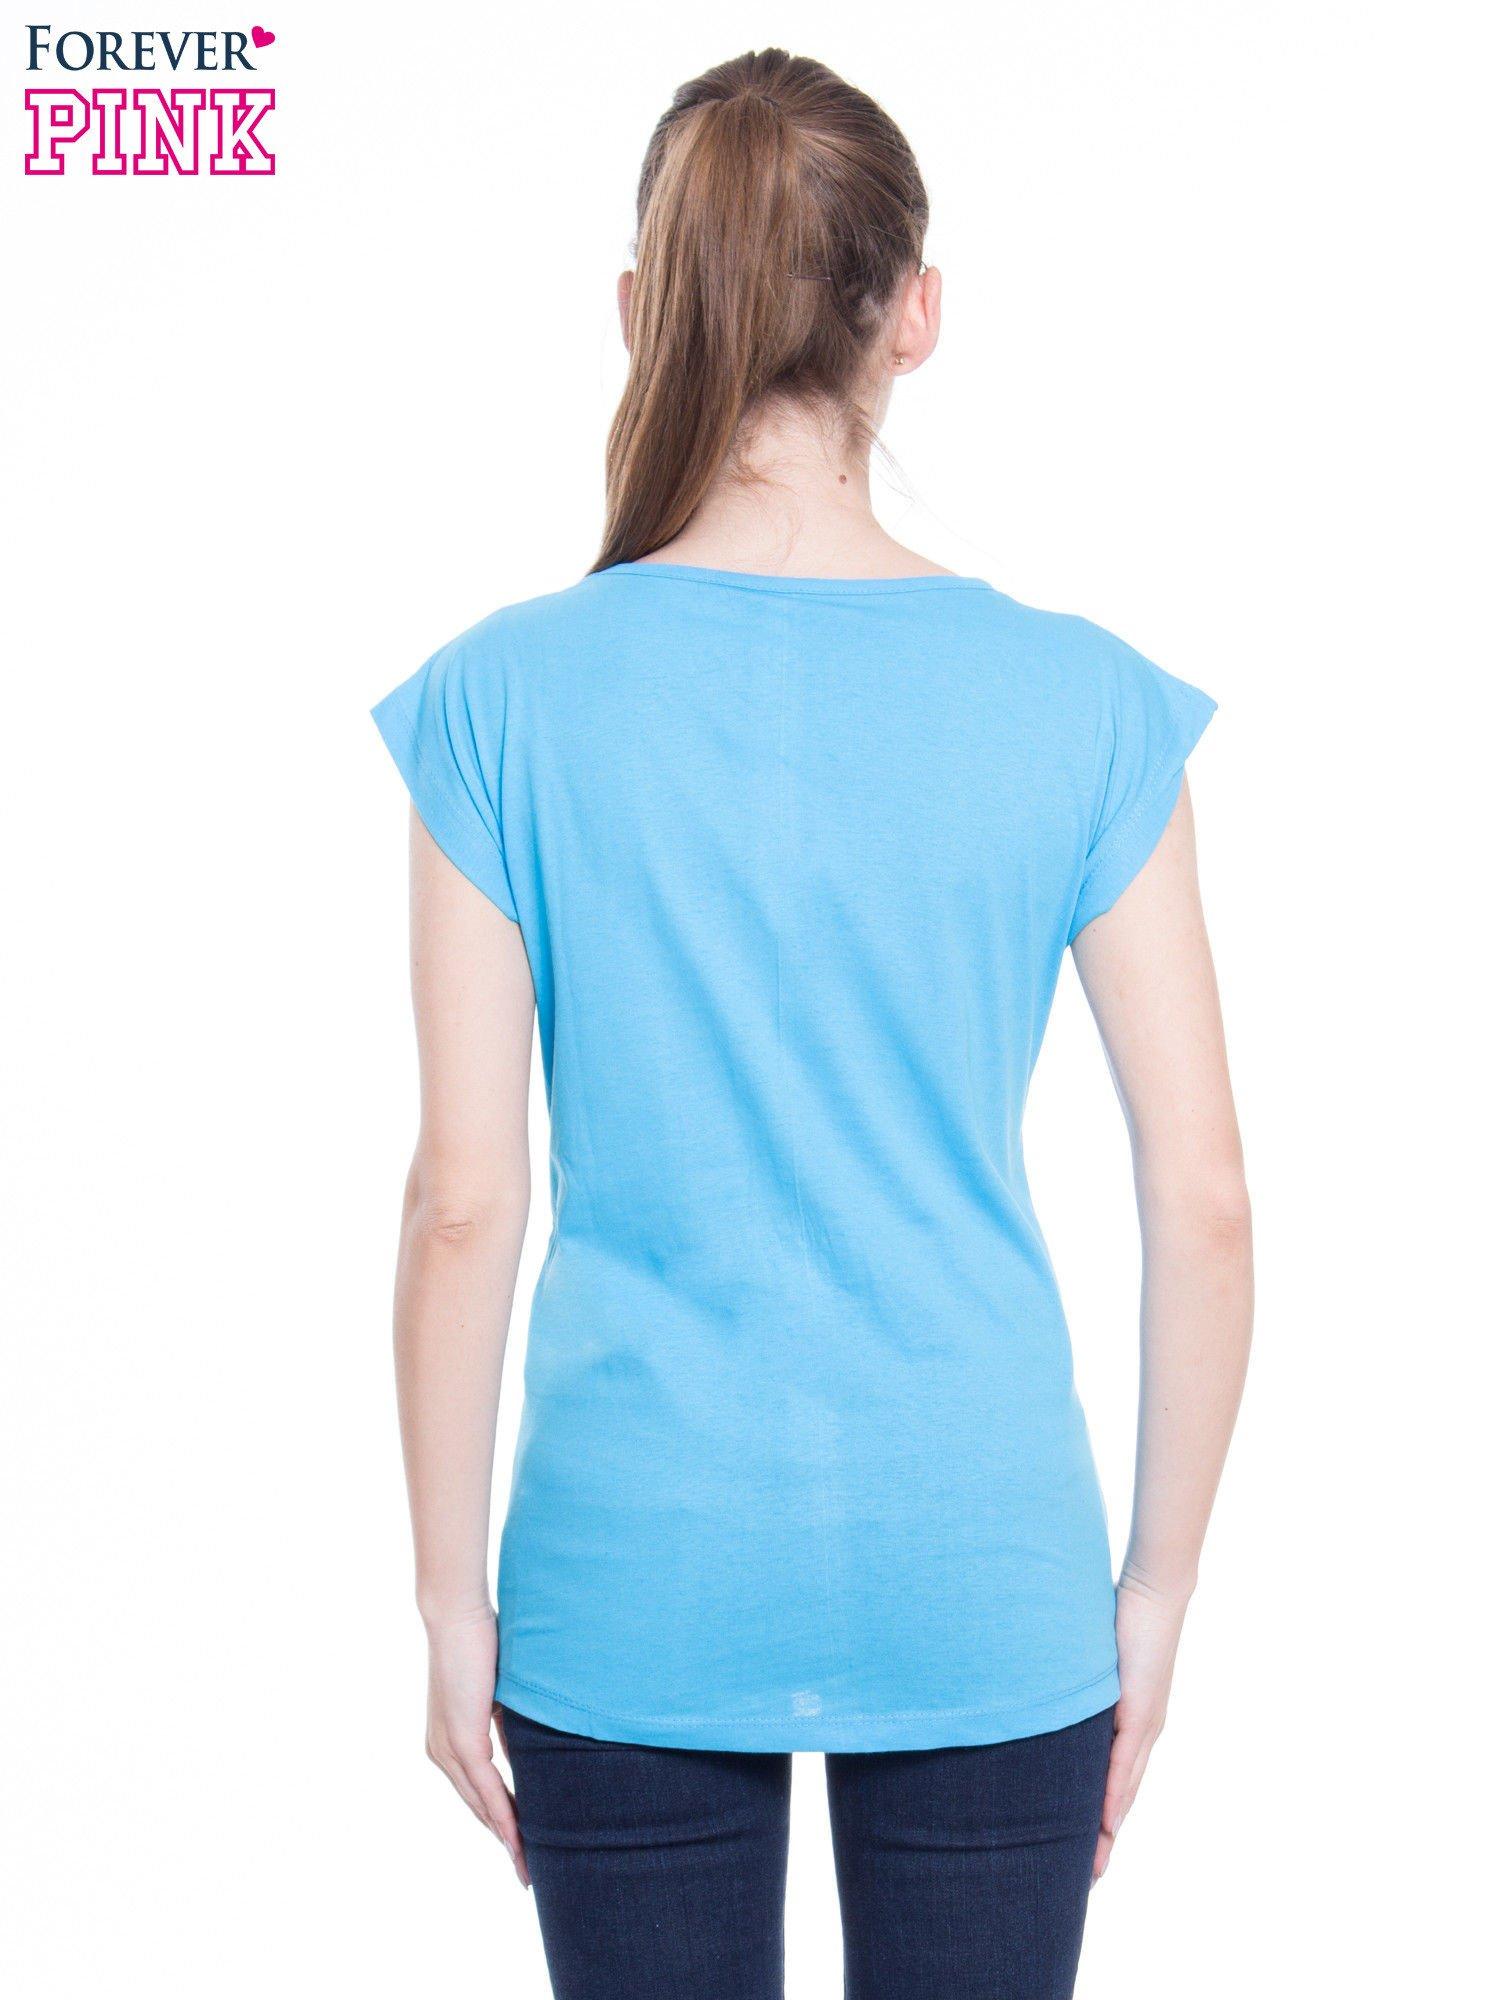 Niebieski t-shirt z nadrukiem flaminga i napisem LESS IS MORE                                  zdj.                                  3